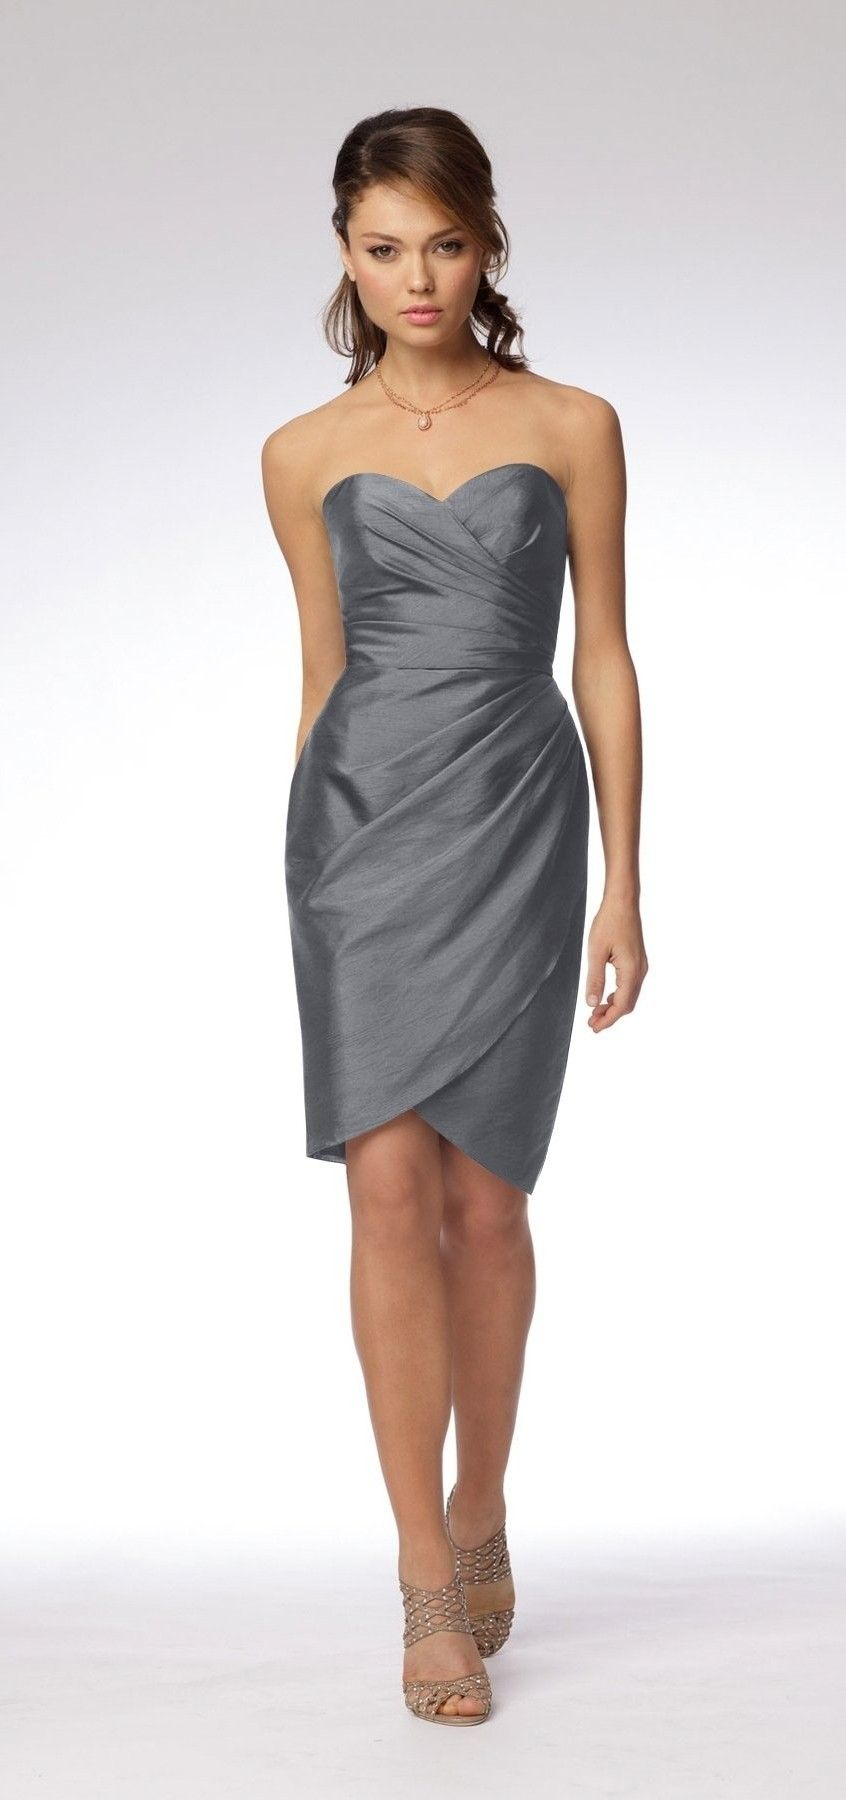 Sliver Sweetheart Strapless Short Graduation Dress 8953